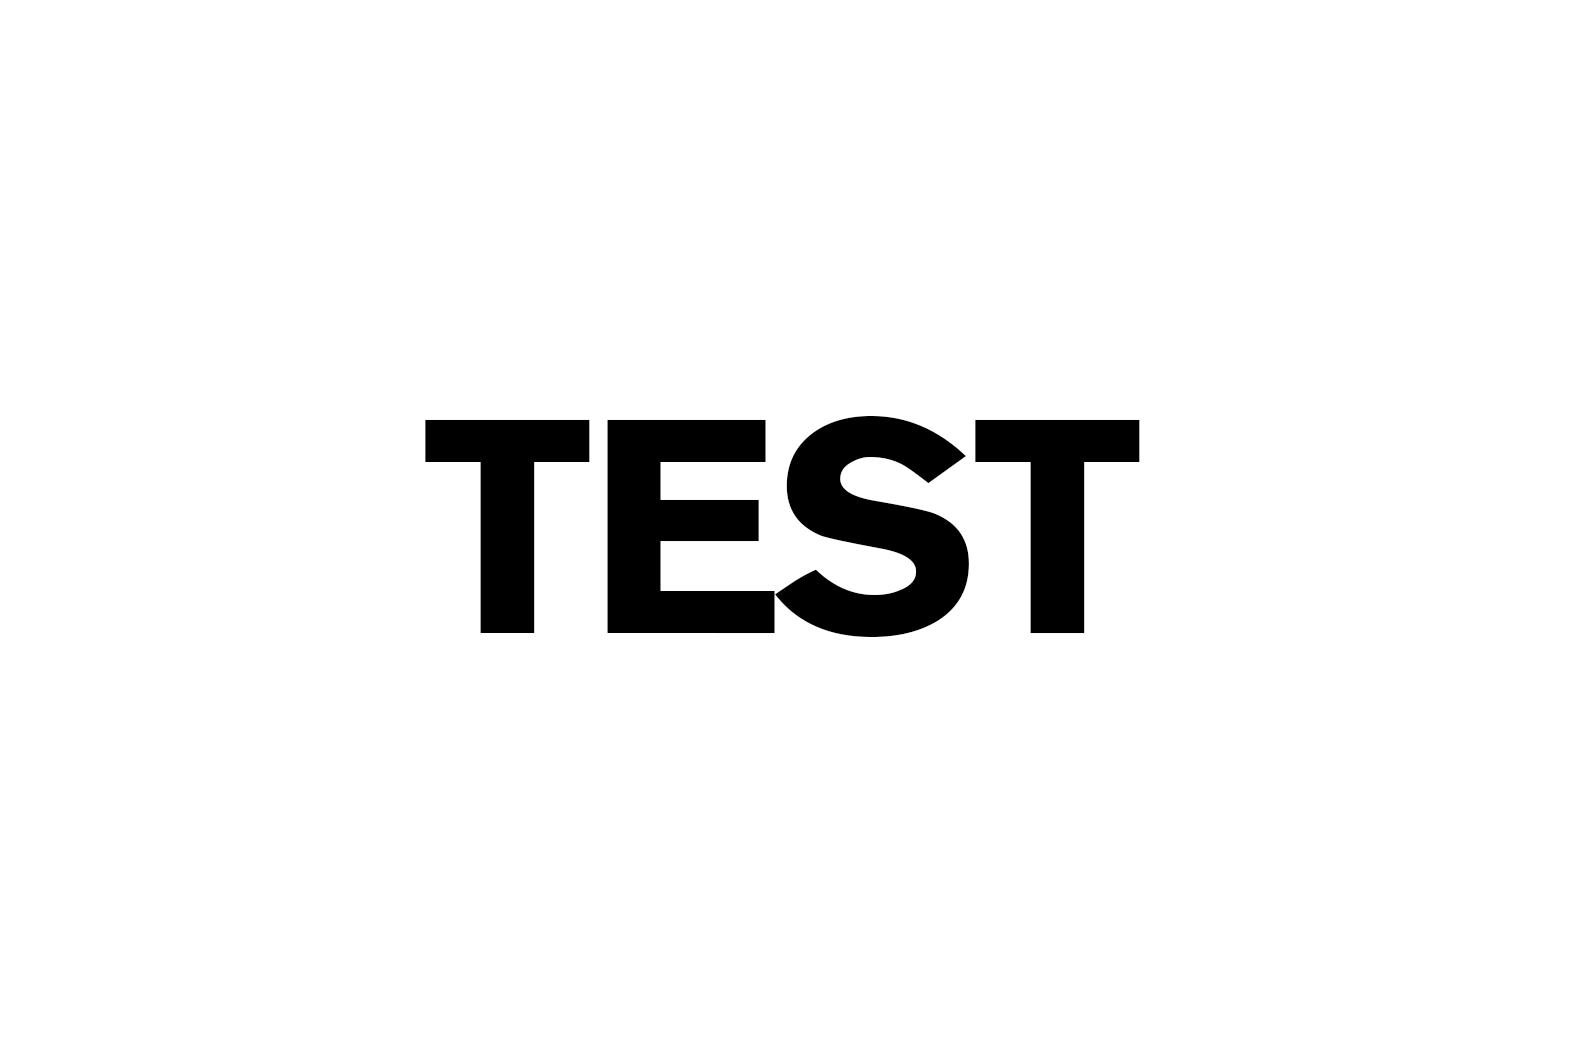 04-01 - TEST - (2015,02,05)